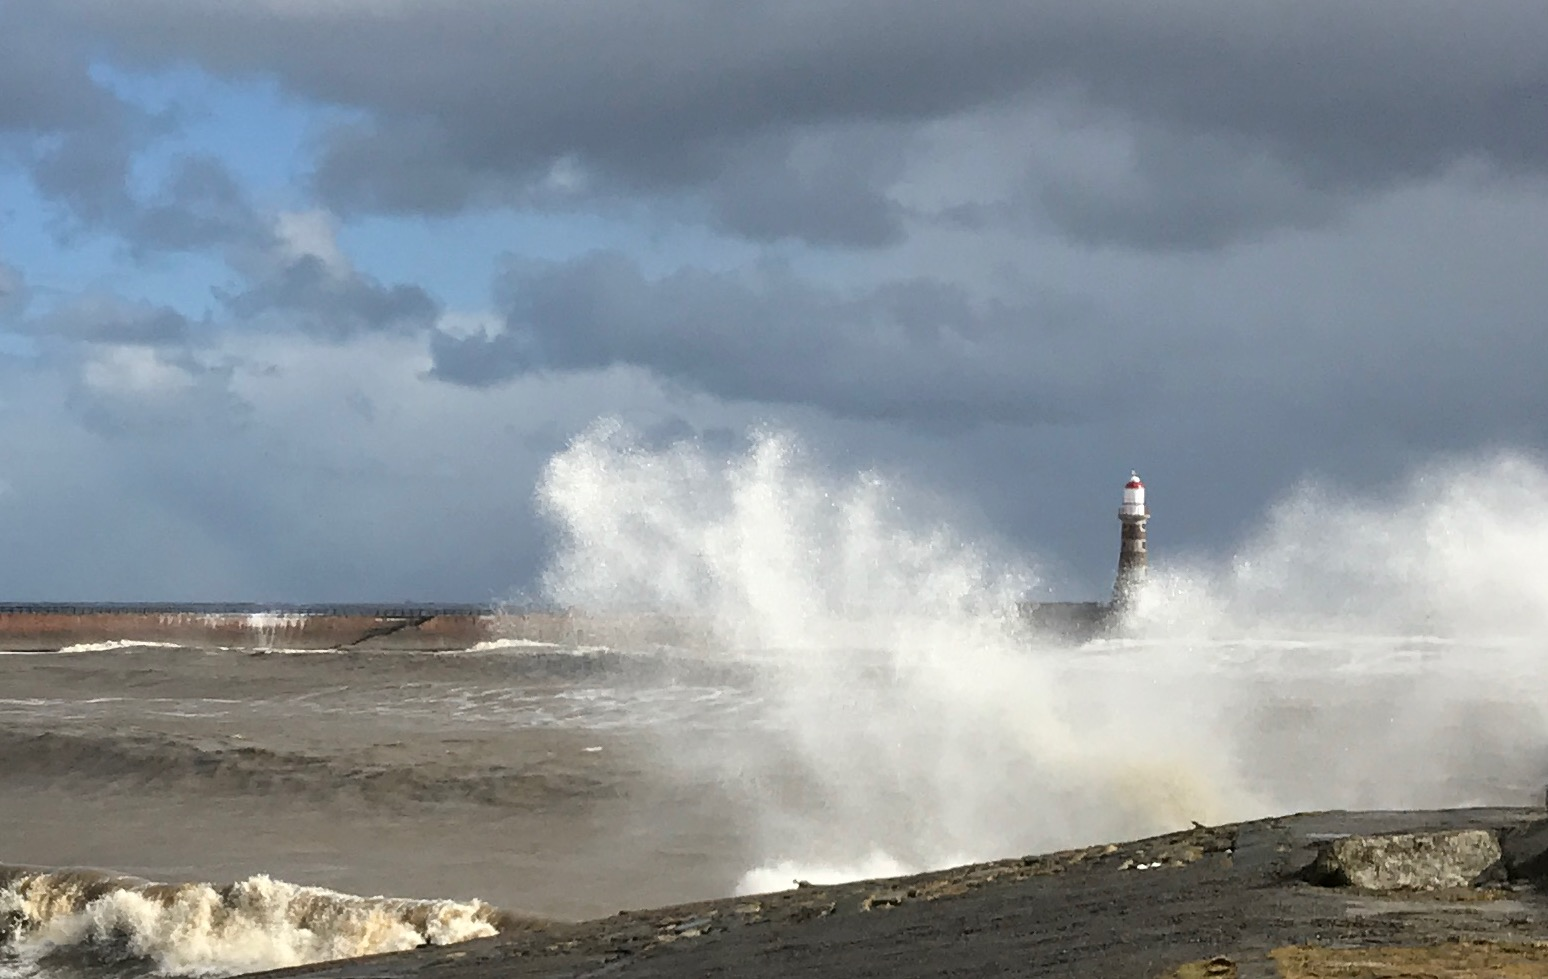 Photo: Michael Otterson. Roker lighthouse in storm, Sunderland, England